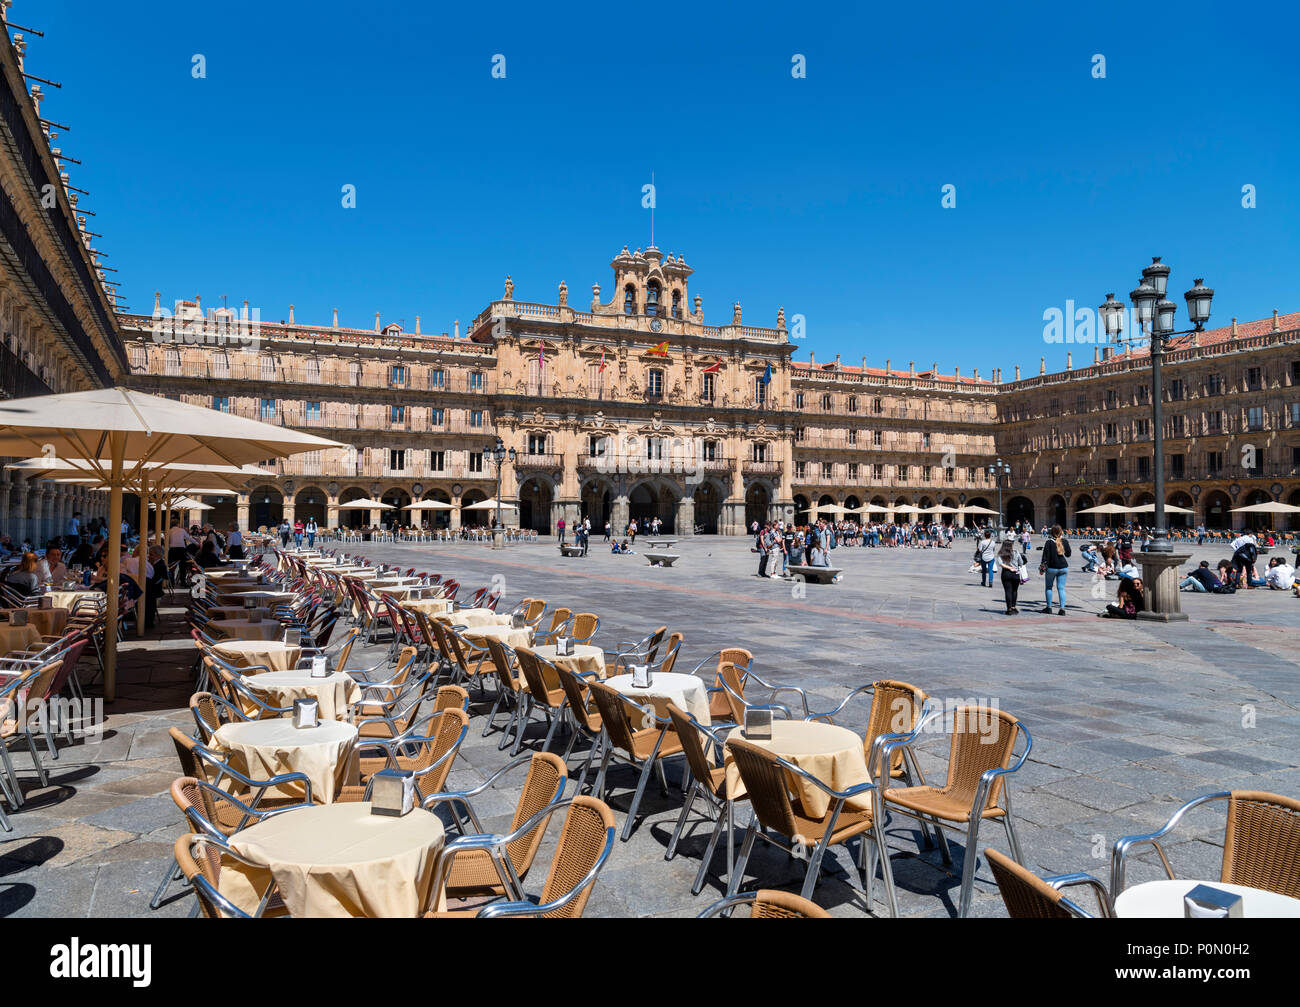 Salamanca, Spain. Cafes in the Plaza Mayor looking towards the City Hall (Ayuntamiento), Salamanca, Castilla y Leon, Spain Stock Photo